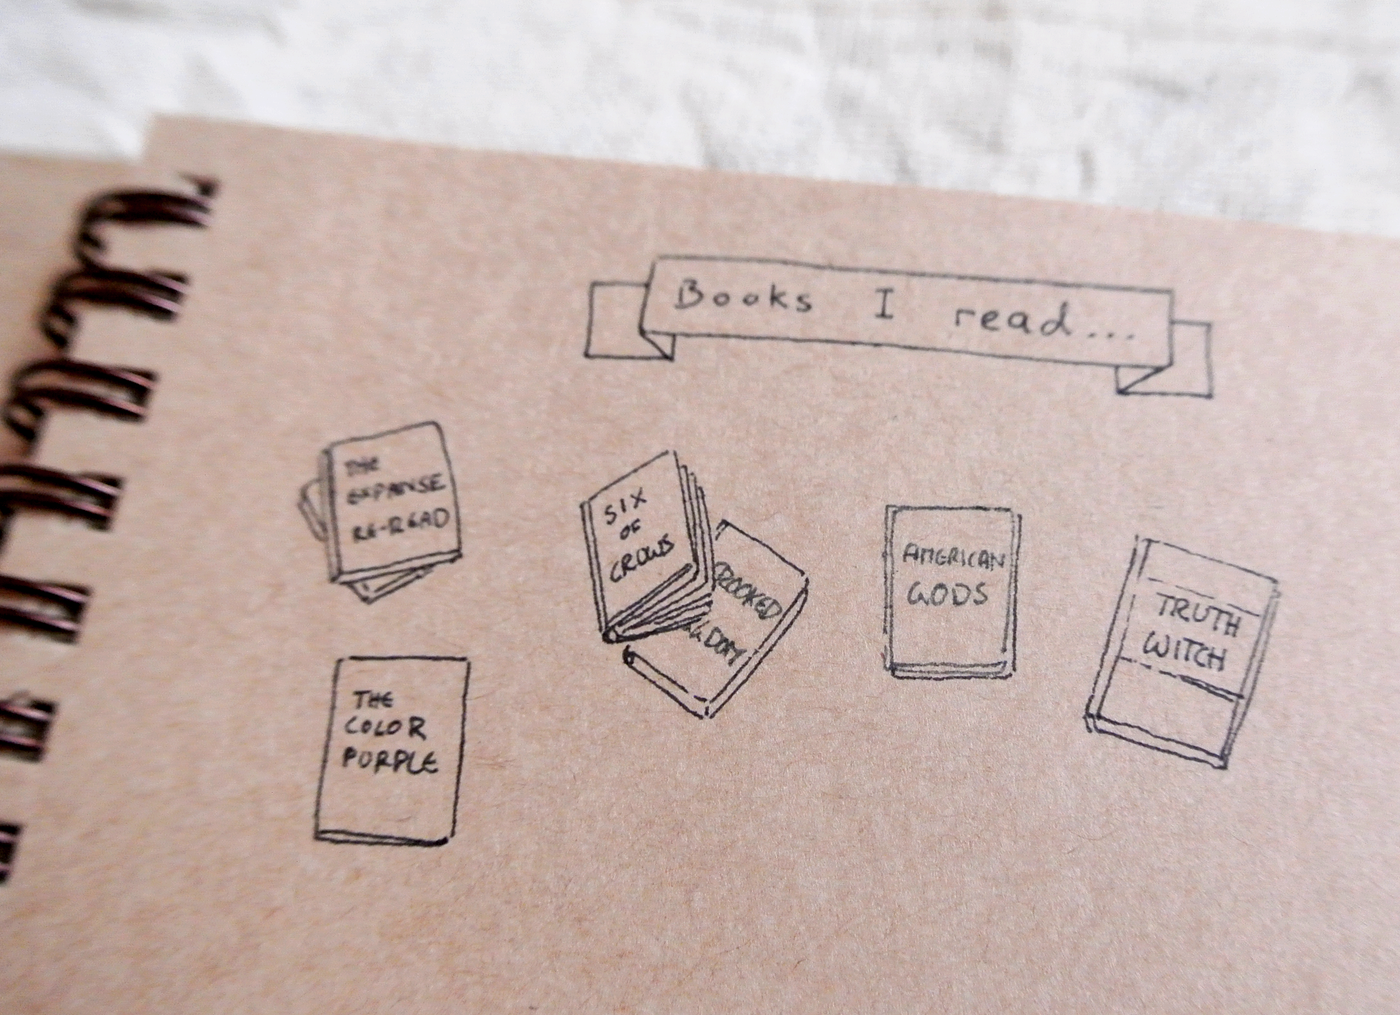 book-reading-list-bullet-journal-minimal